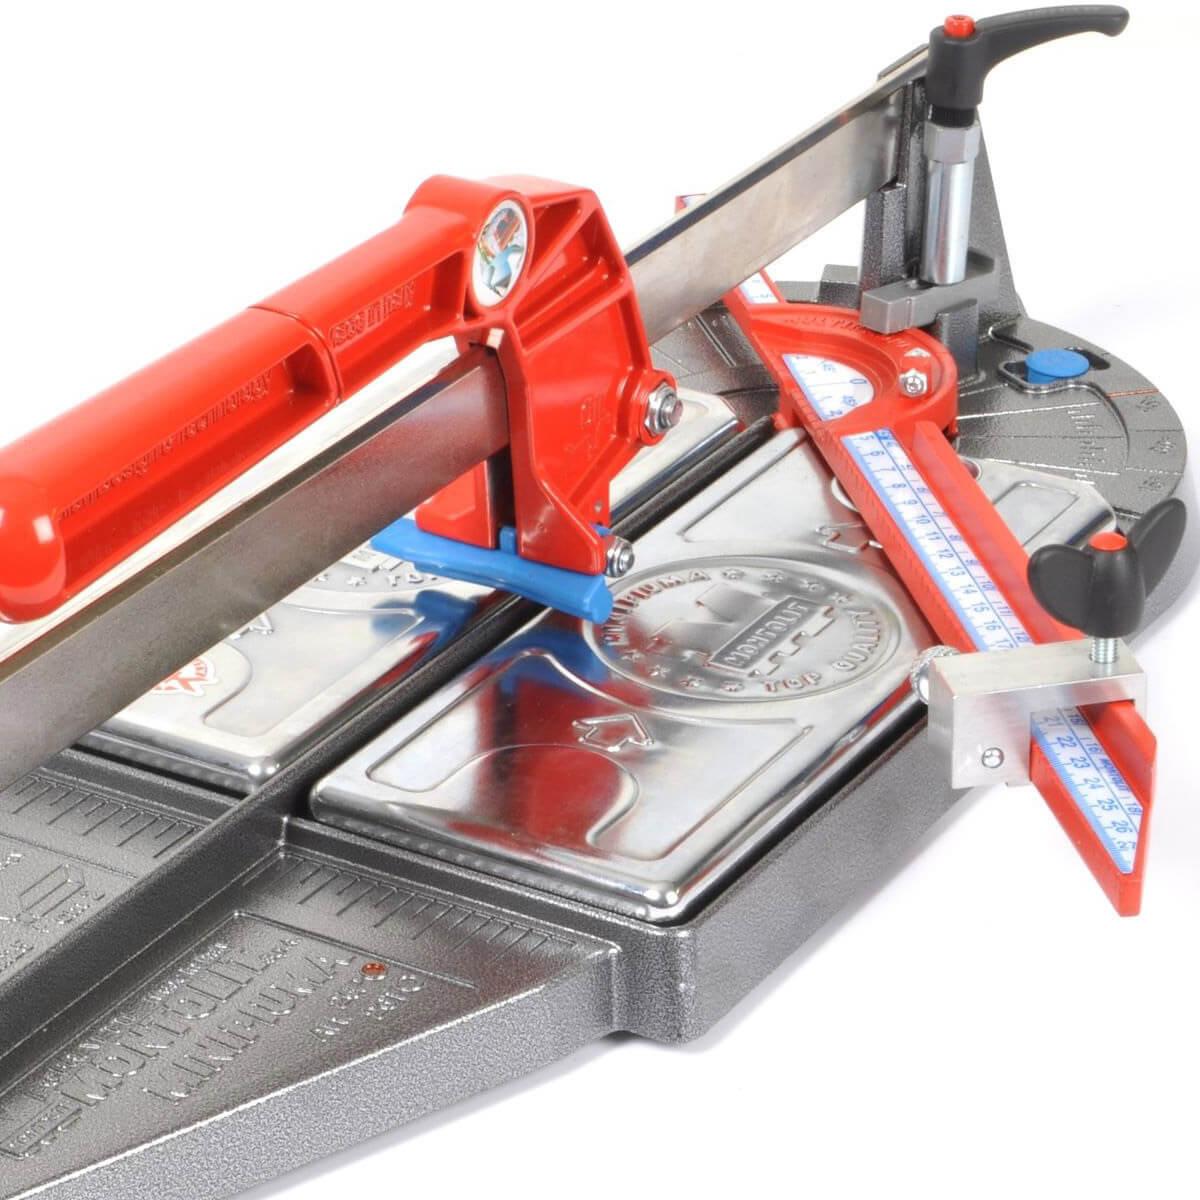 Montolit Minipiuma Tile Cutter Case